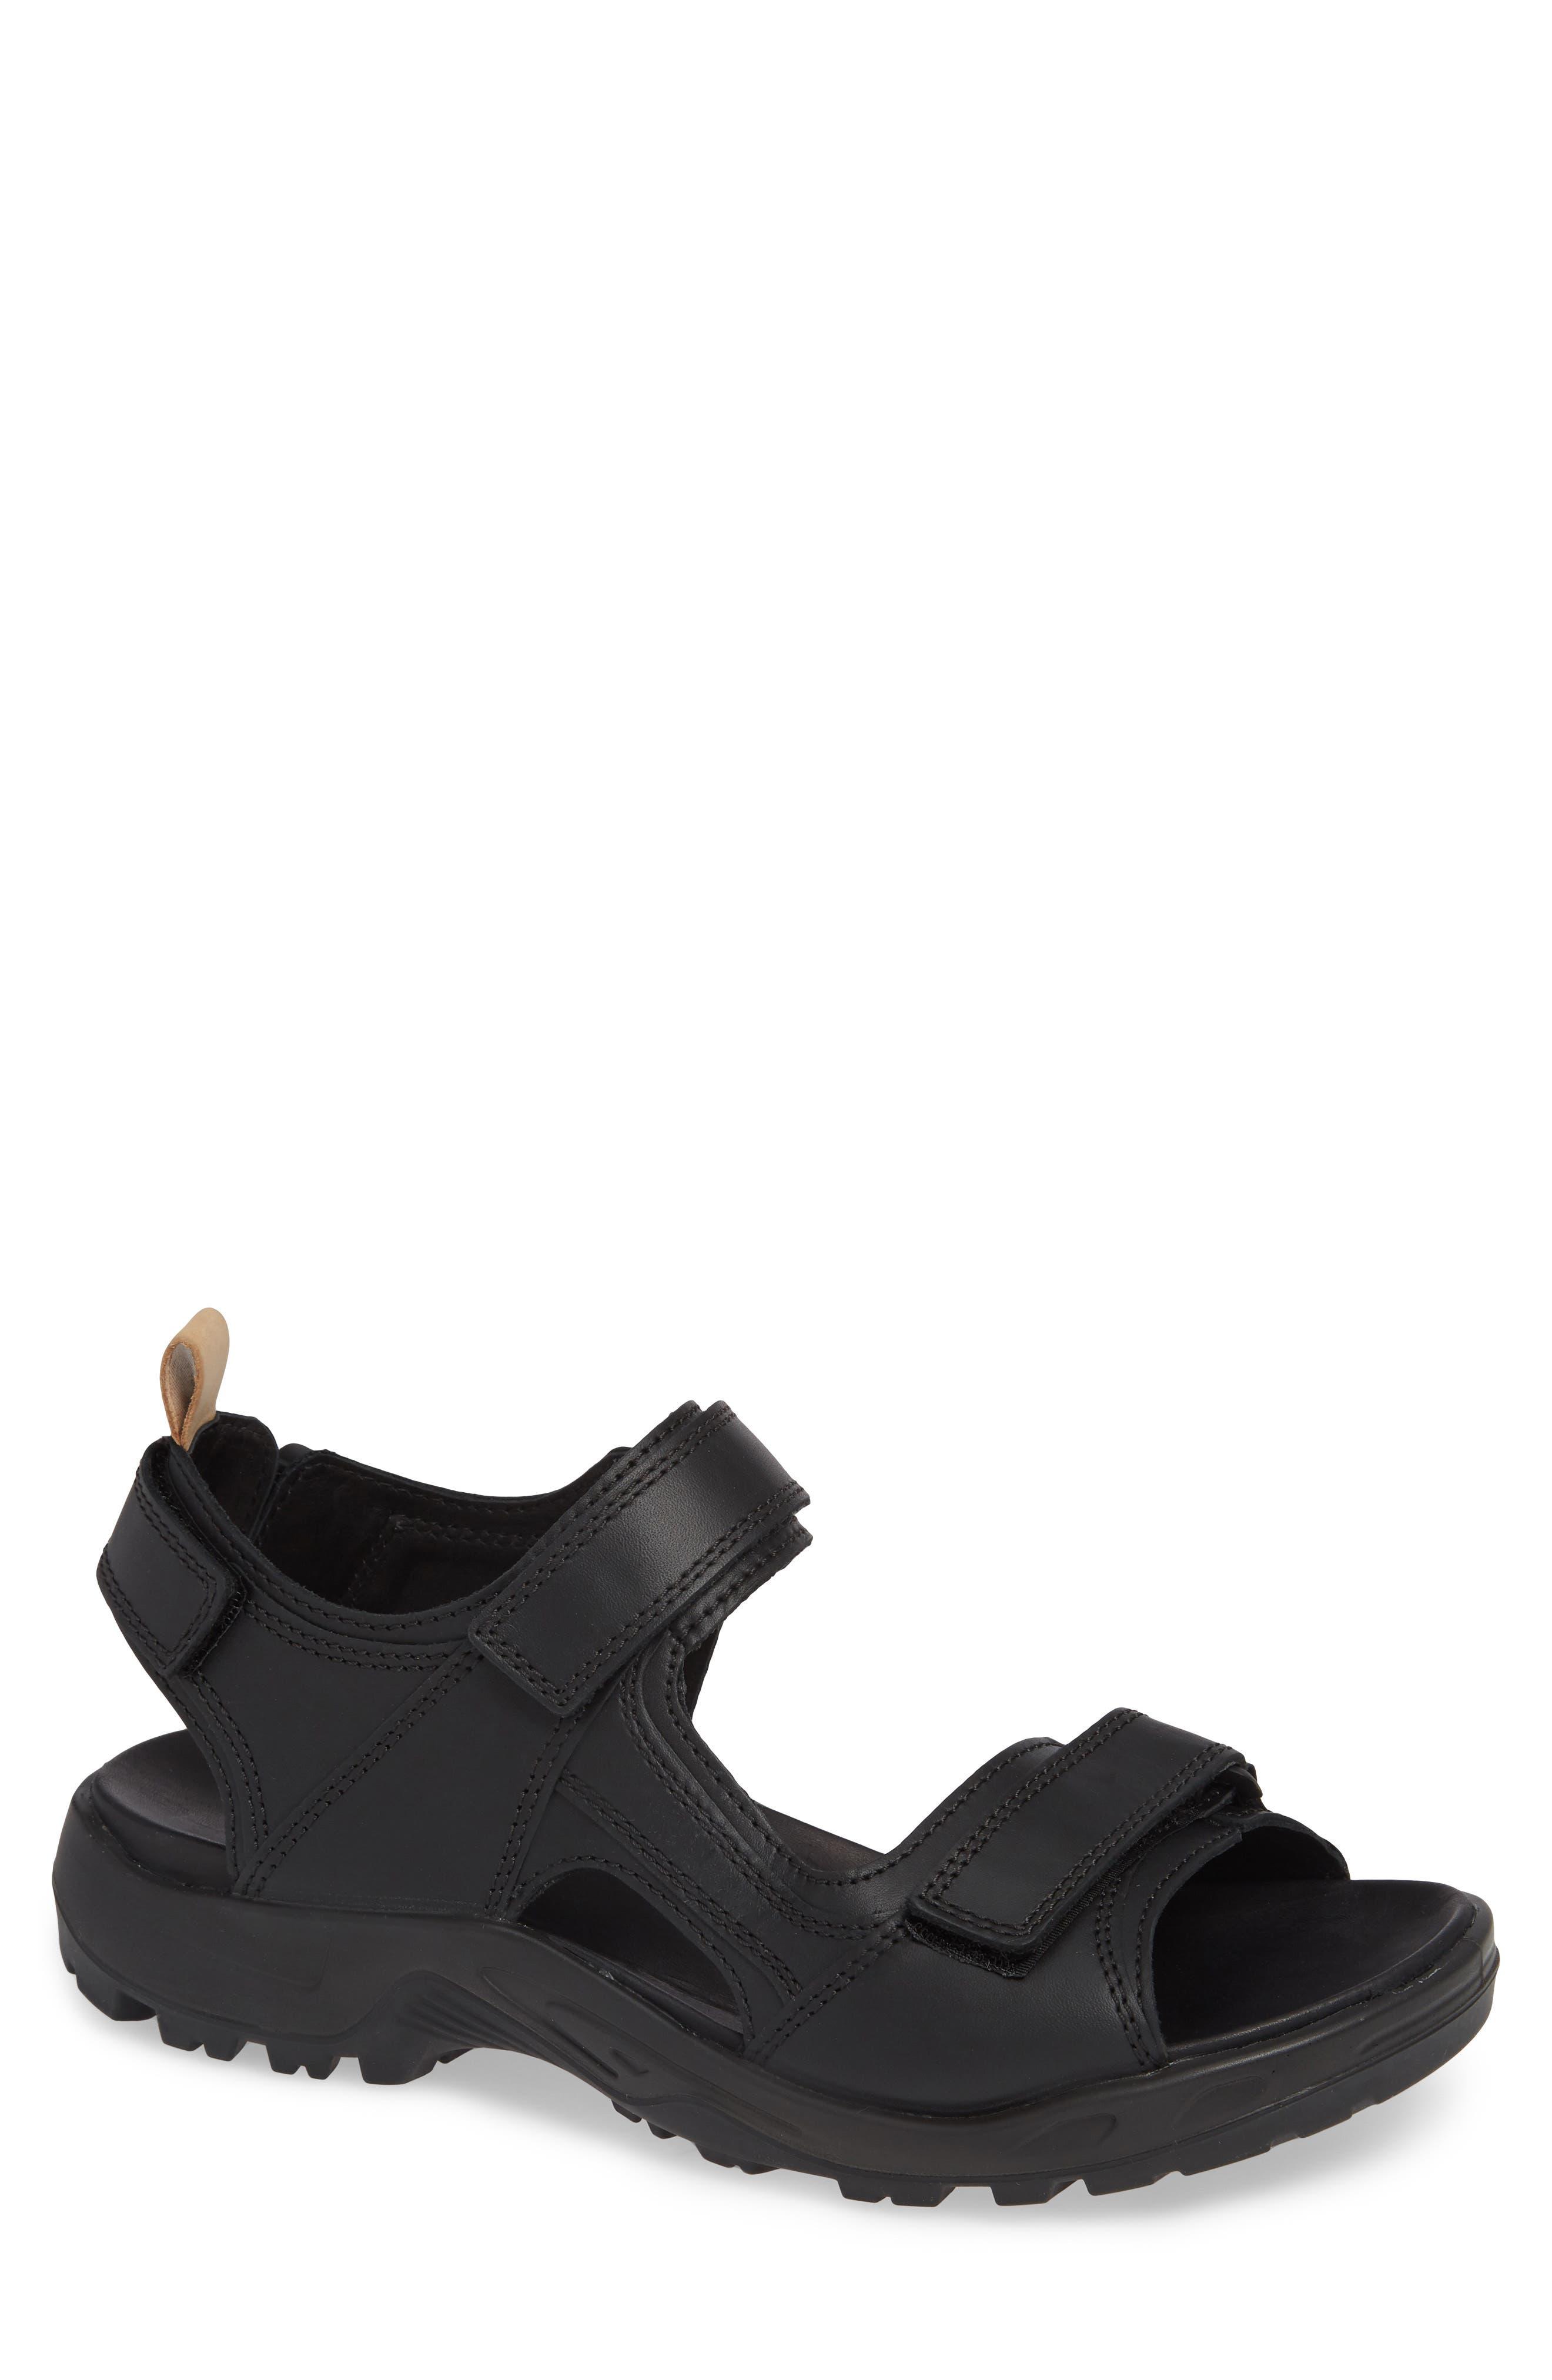 Premium Offroad Sandal,                         Main,                         color, BLACK LEATHER